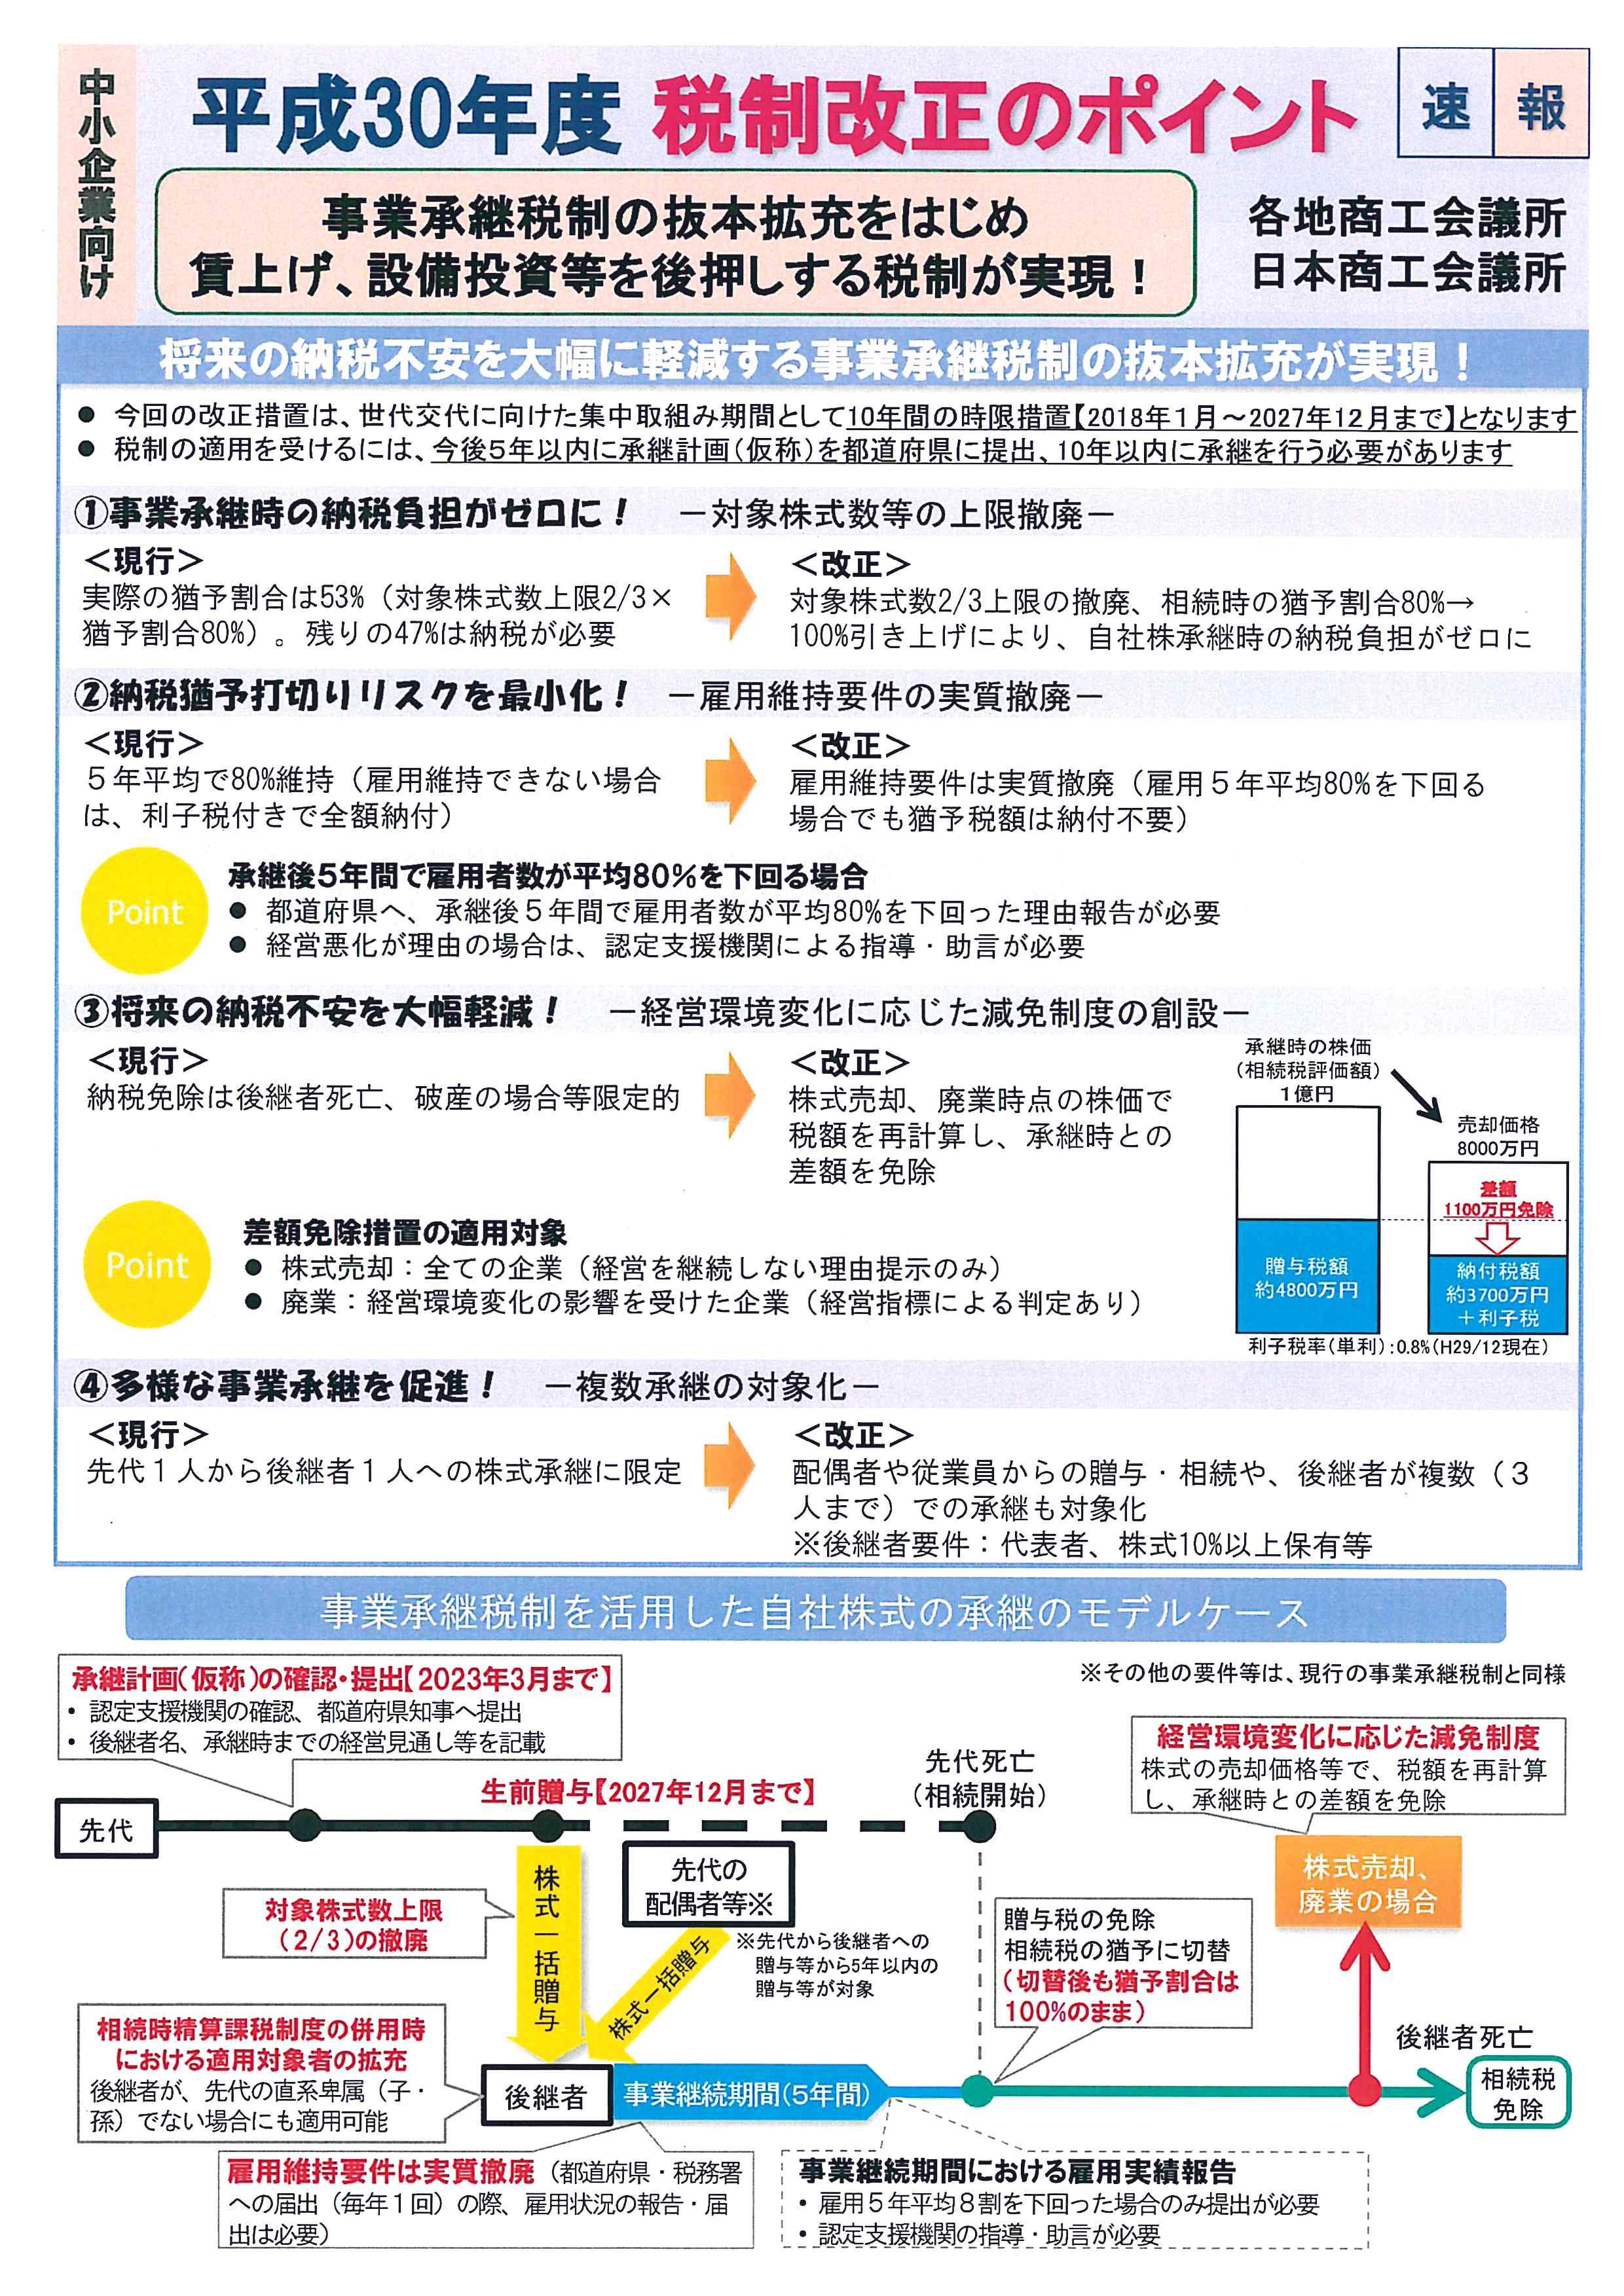 http://miyazawa-kaikei.com/press/user_upload/doc09380320180423160341_001.jpg